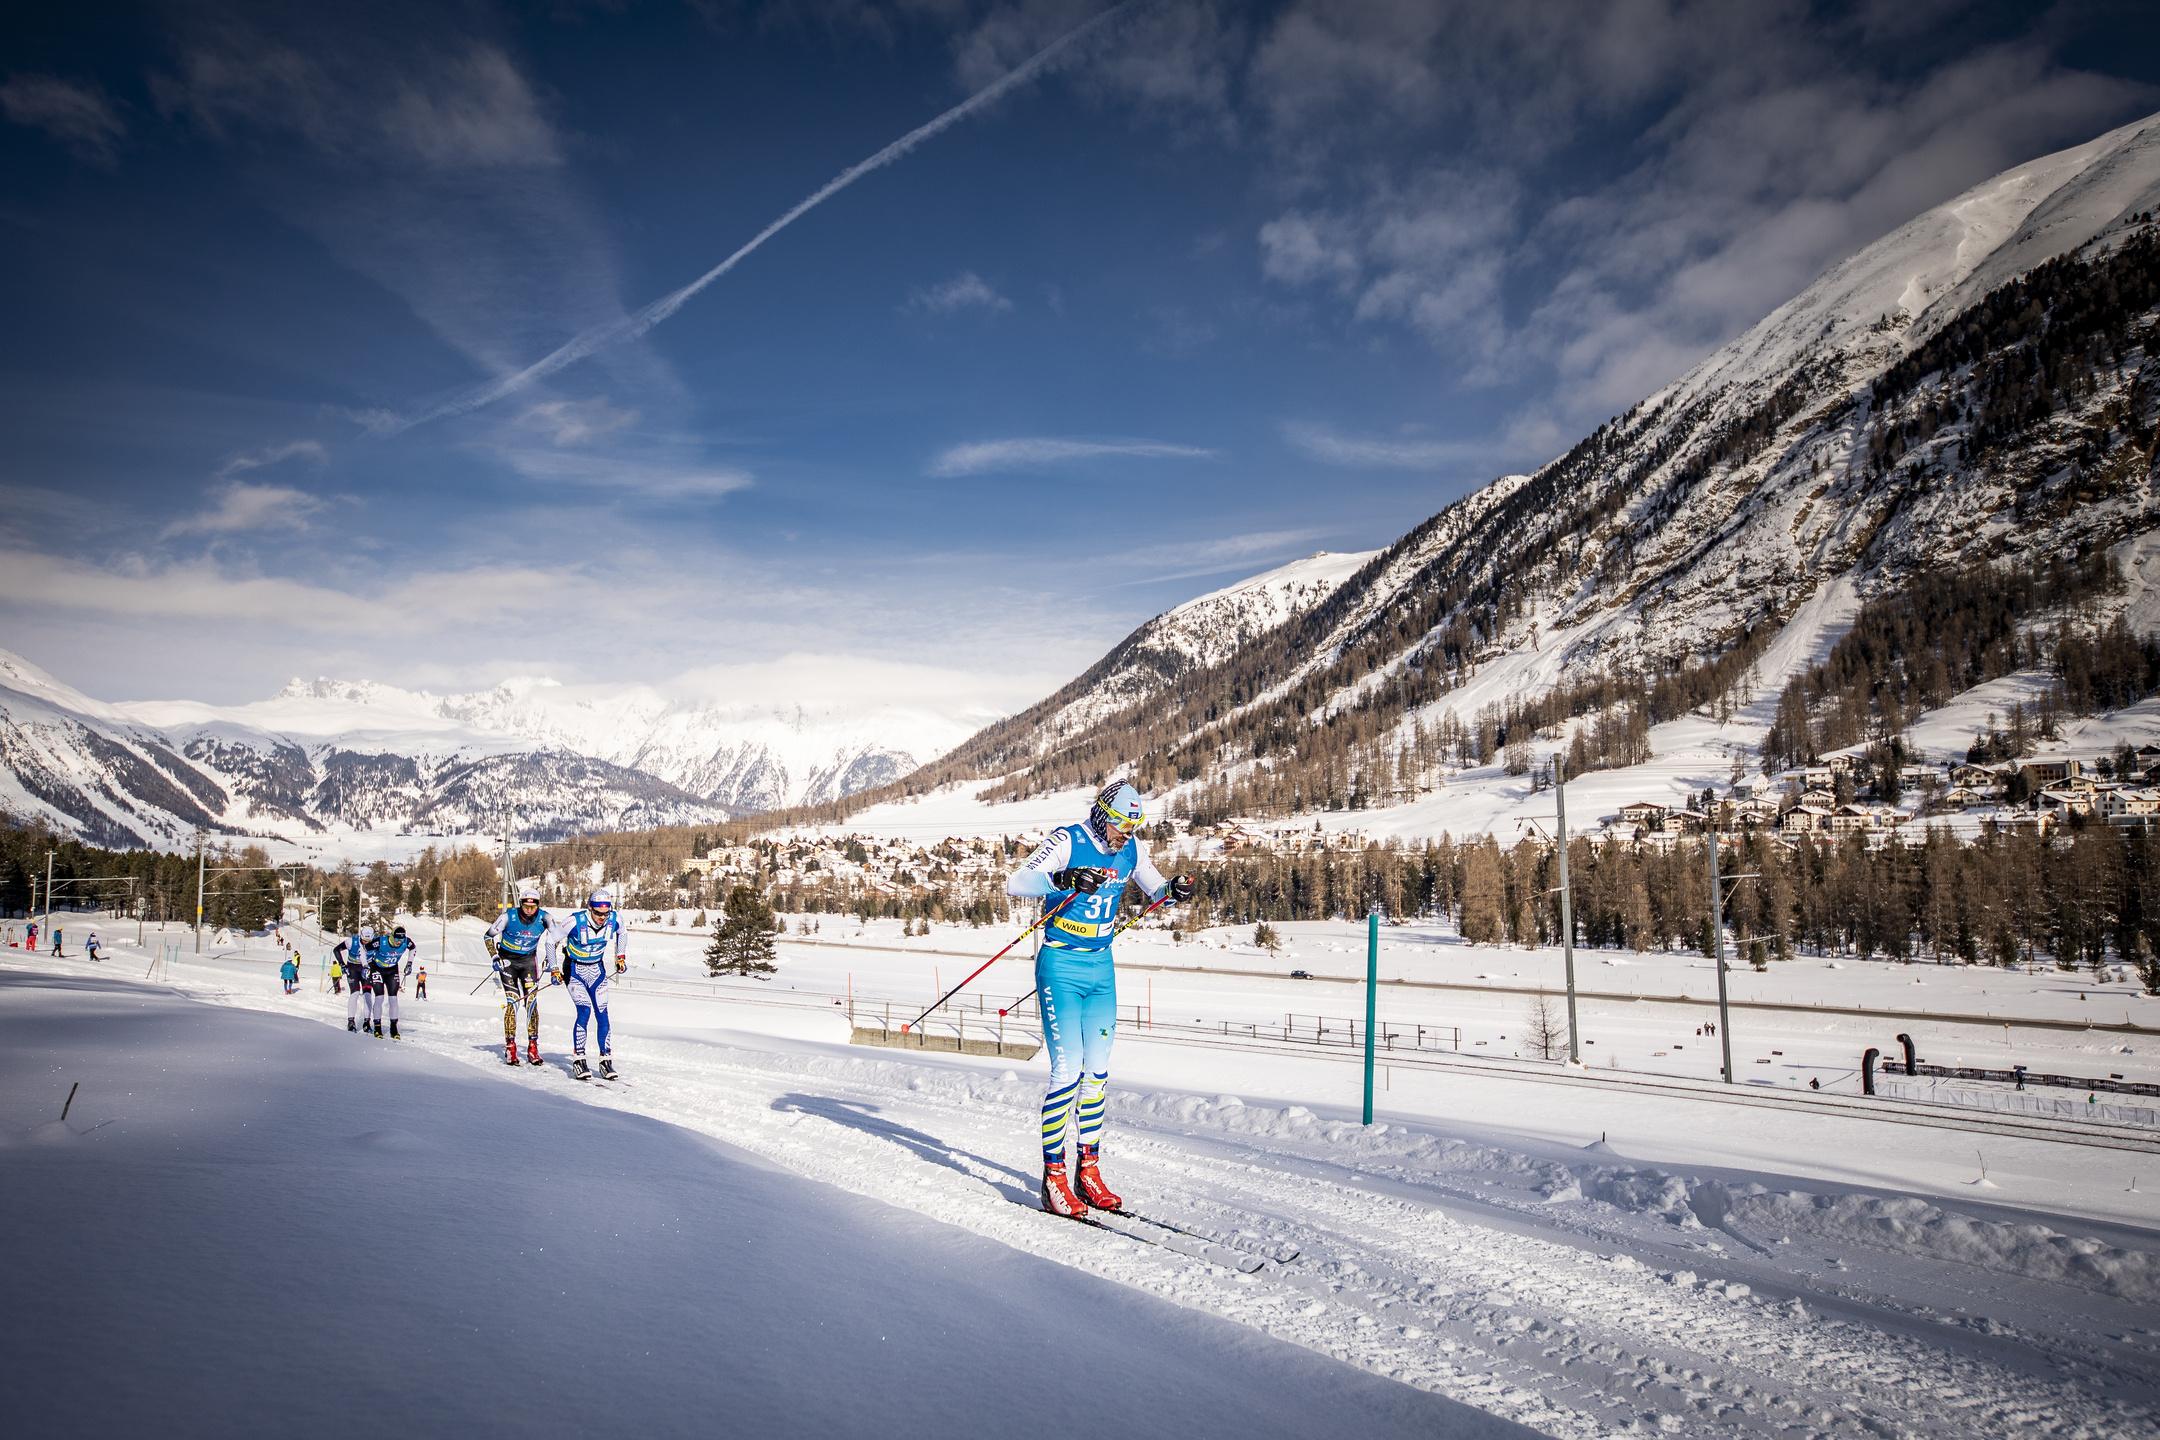 Calendrier Ski De Fond 2021 Ski de fond   Ski Classics   Le calendrier 2021   Sports Infos